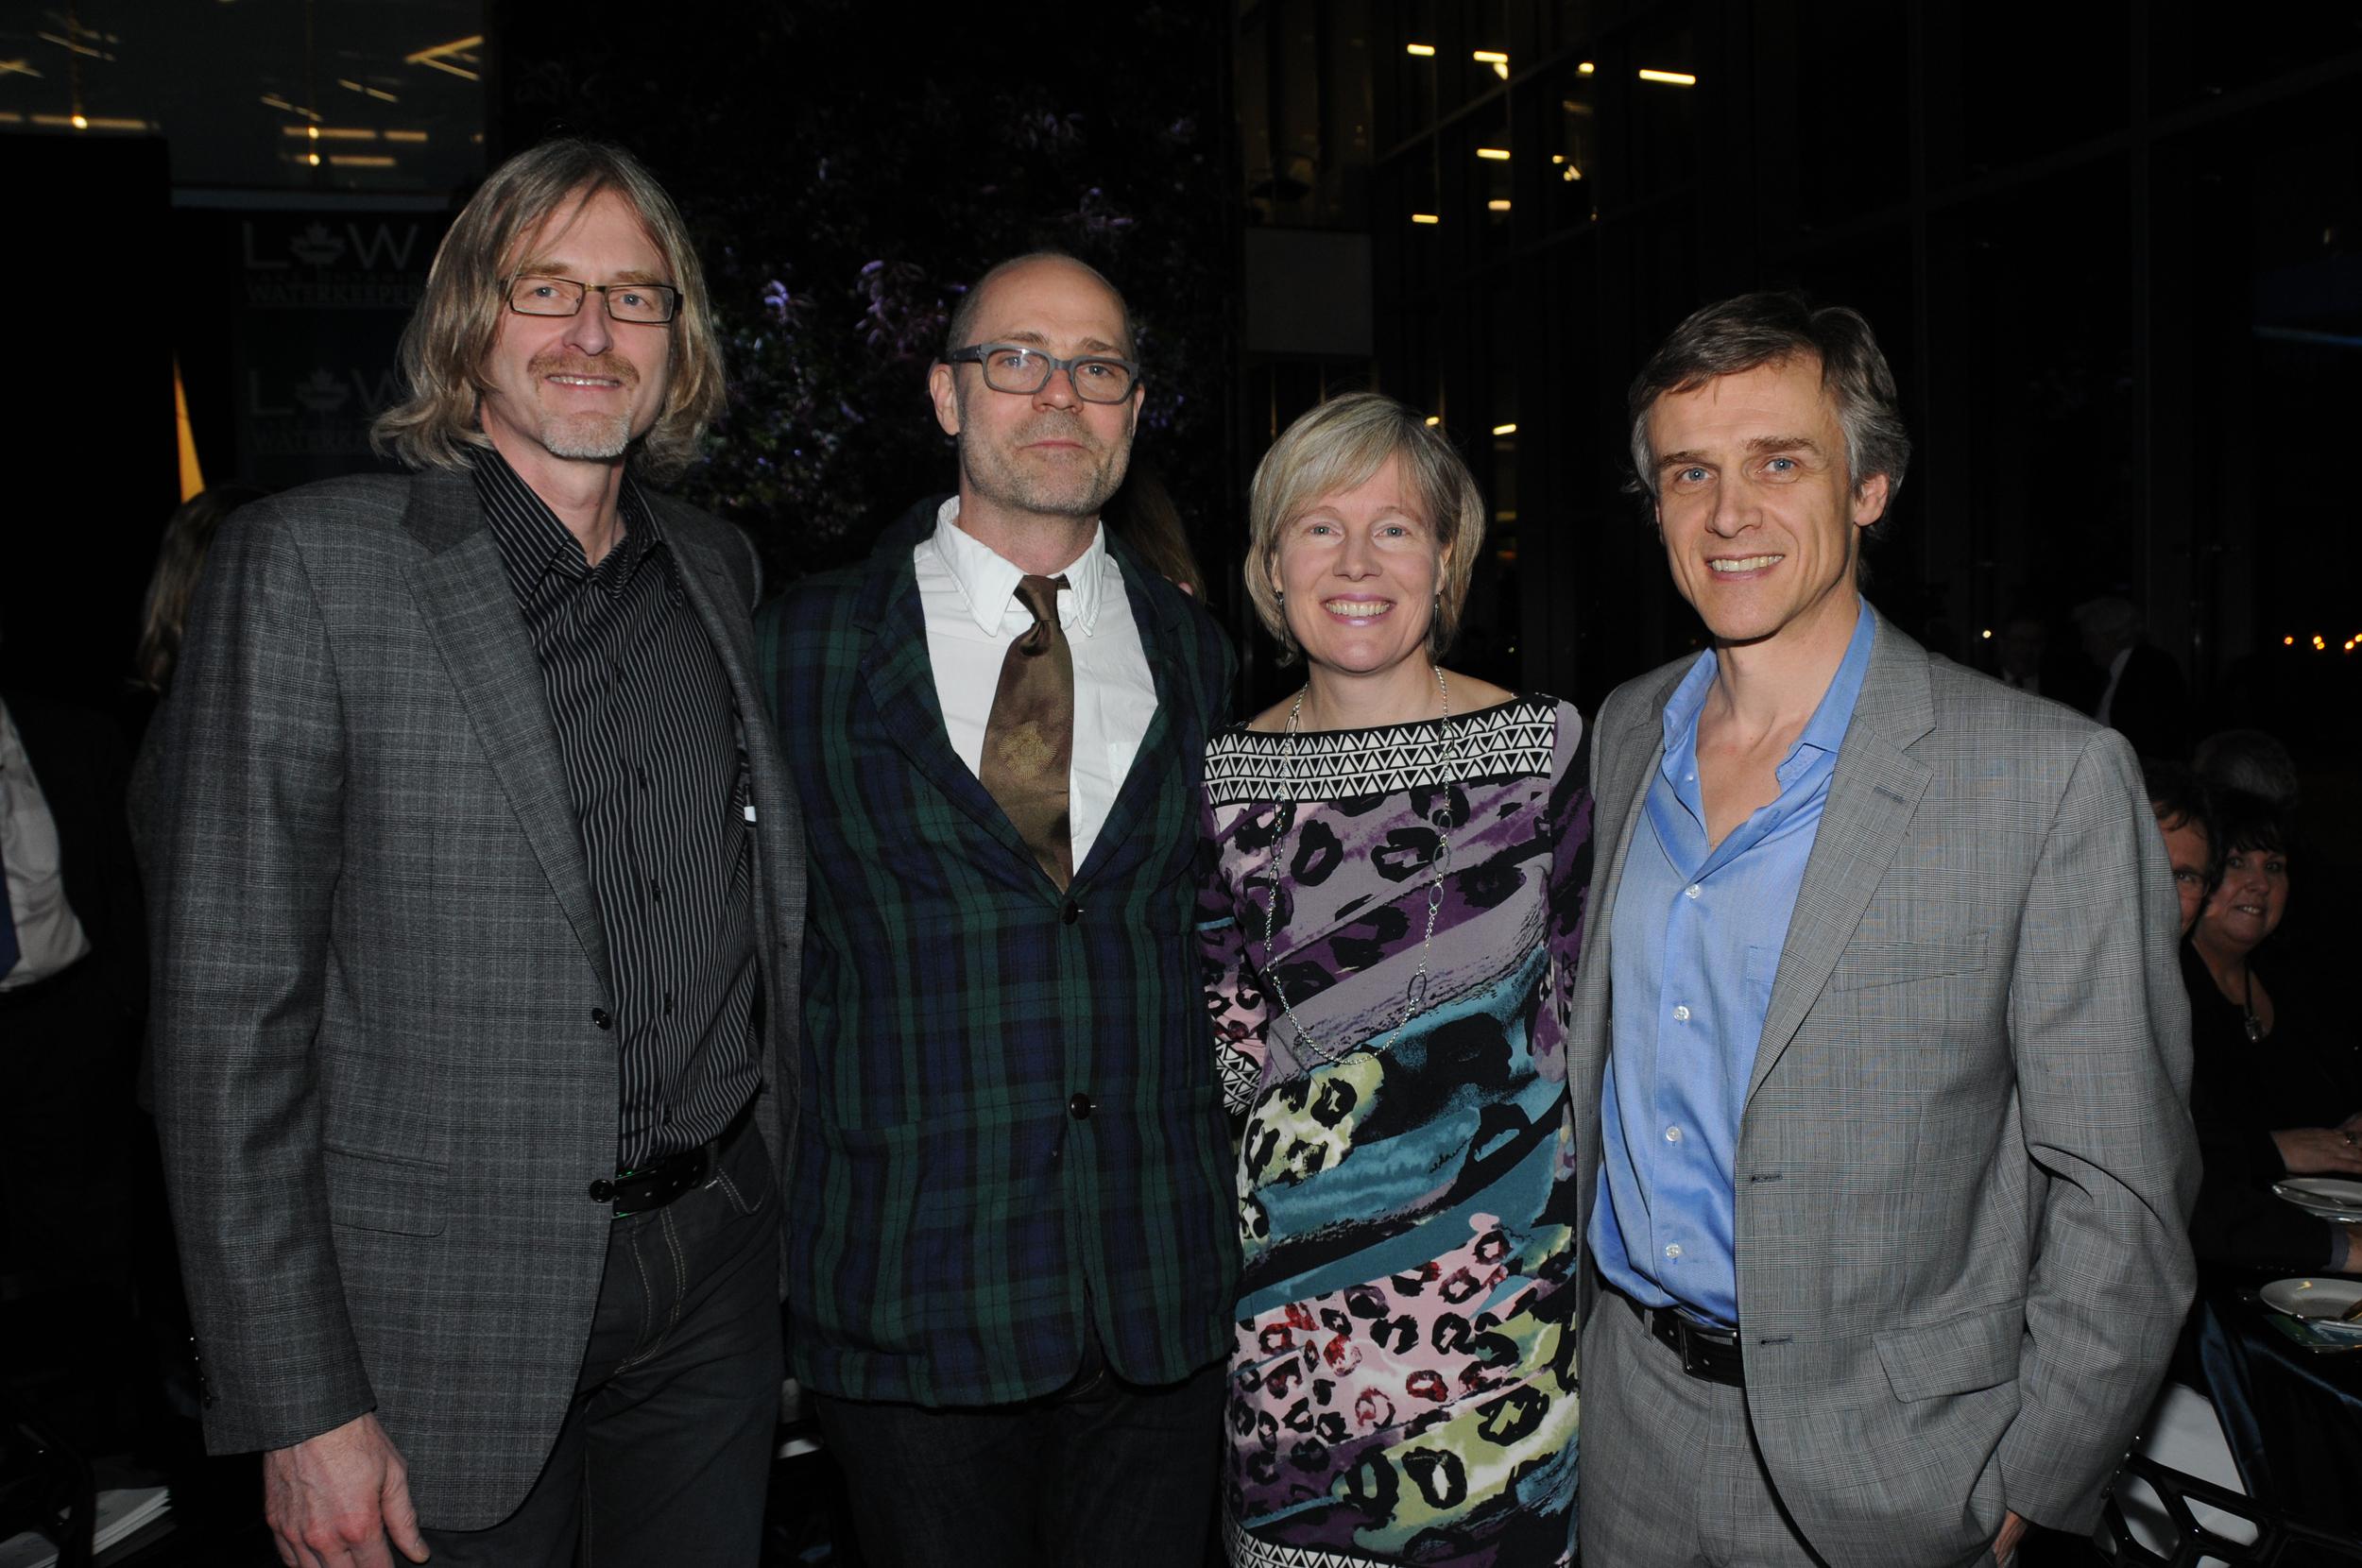 From left to right: Greg Kiessling, Gord Downie, Pam Isaak, and Tom Heintzman.